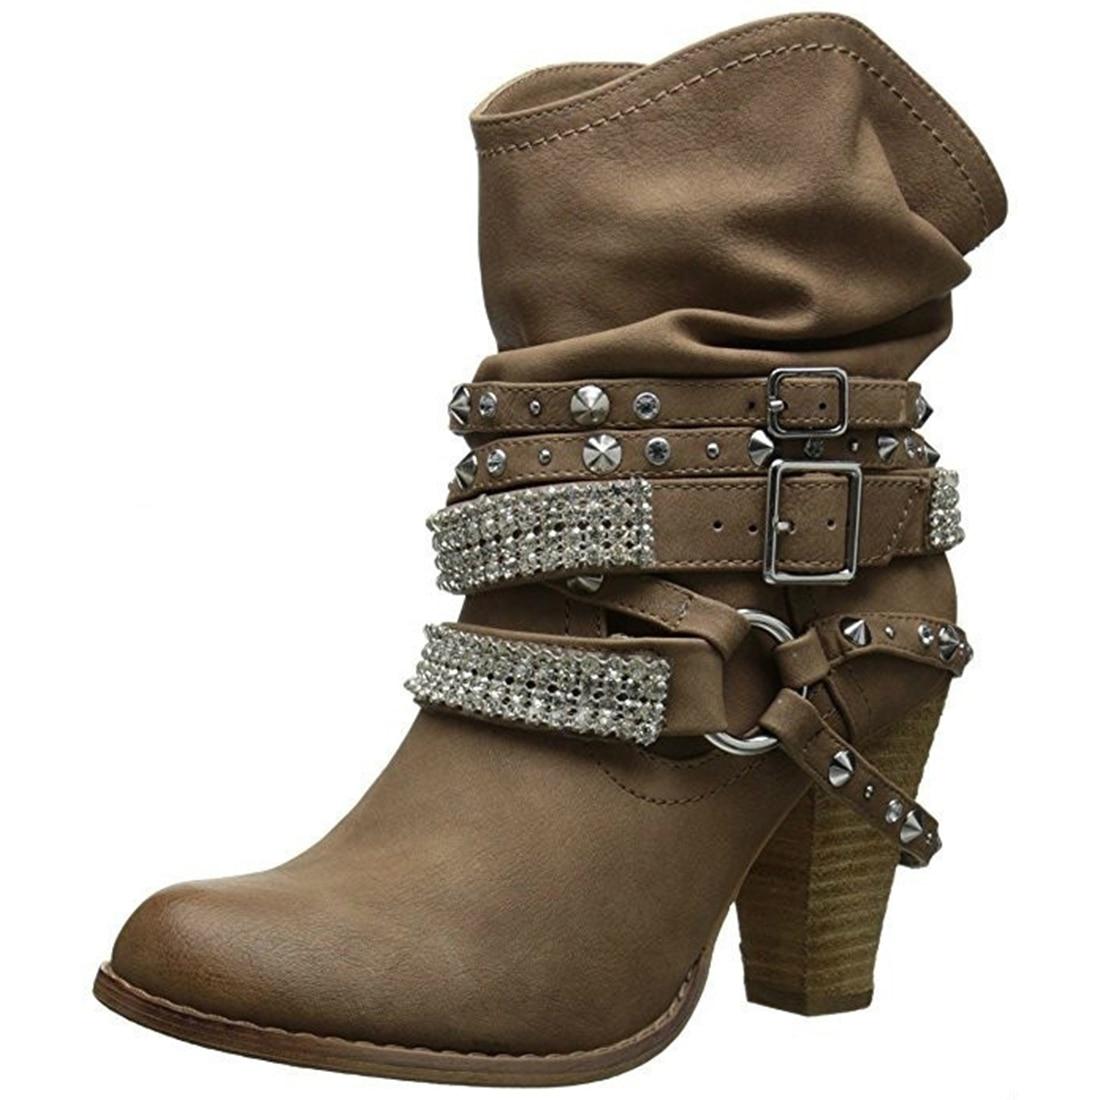 2018 Autumn Winter Shoes women Punk style high heel Boots rivet belt Buckle snow boots PU leather retro mid-calf boots plus size whitesun plus size boots women martin boots autumn winter shoes female ankle boots buckle retro style chunky heel short boots